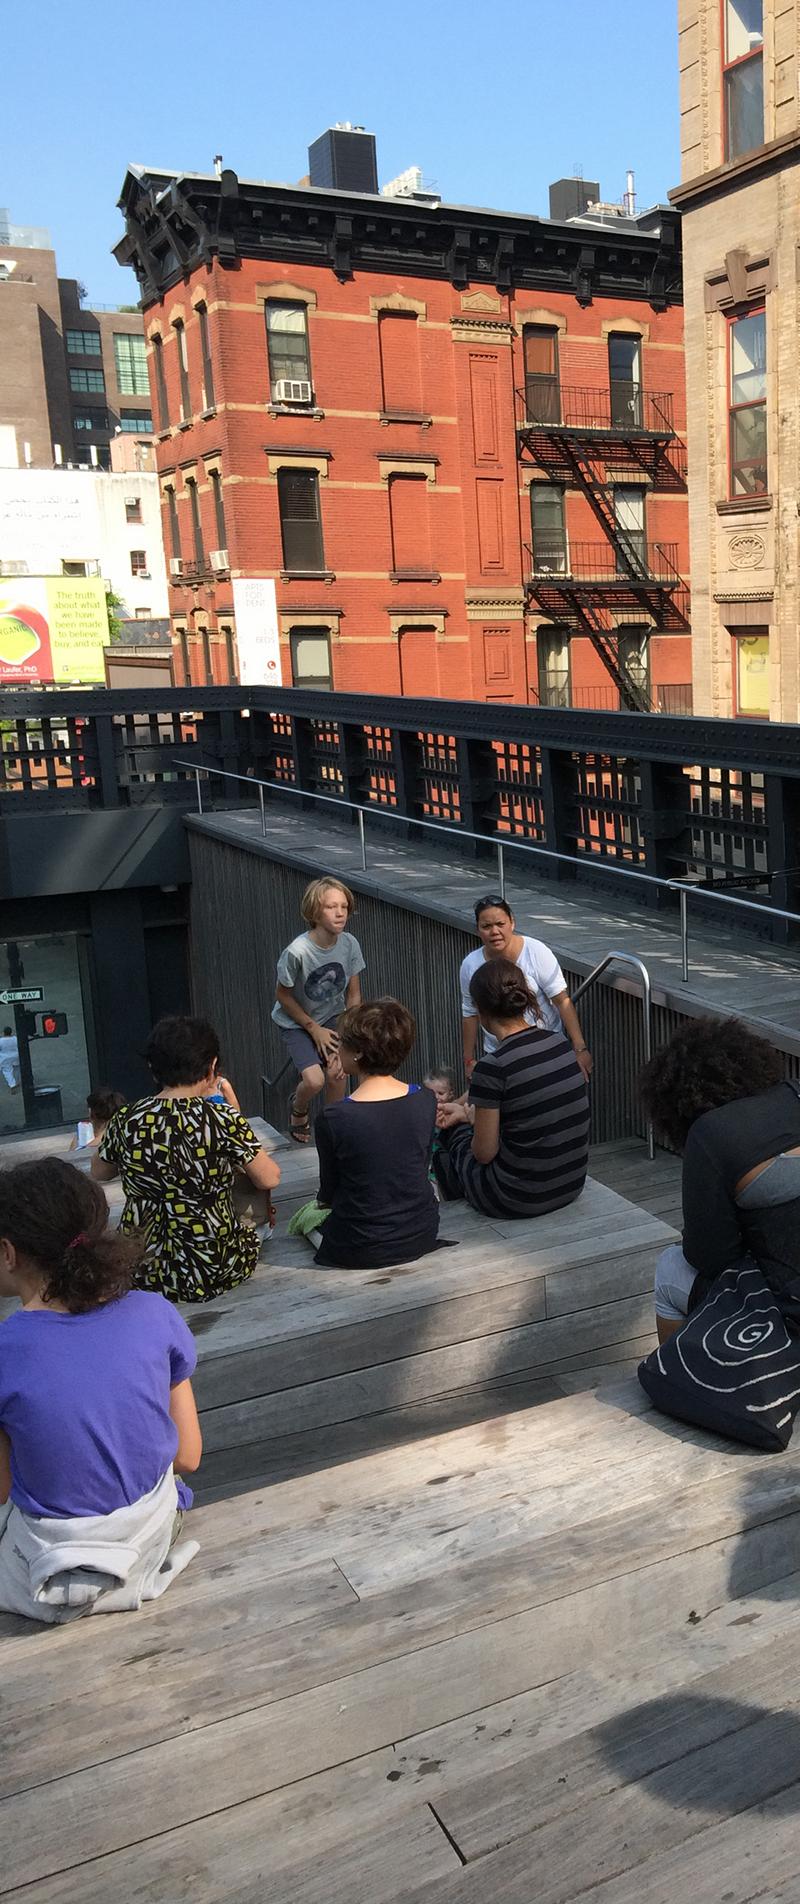 Post 4 - High Line, New York